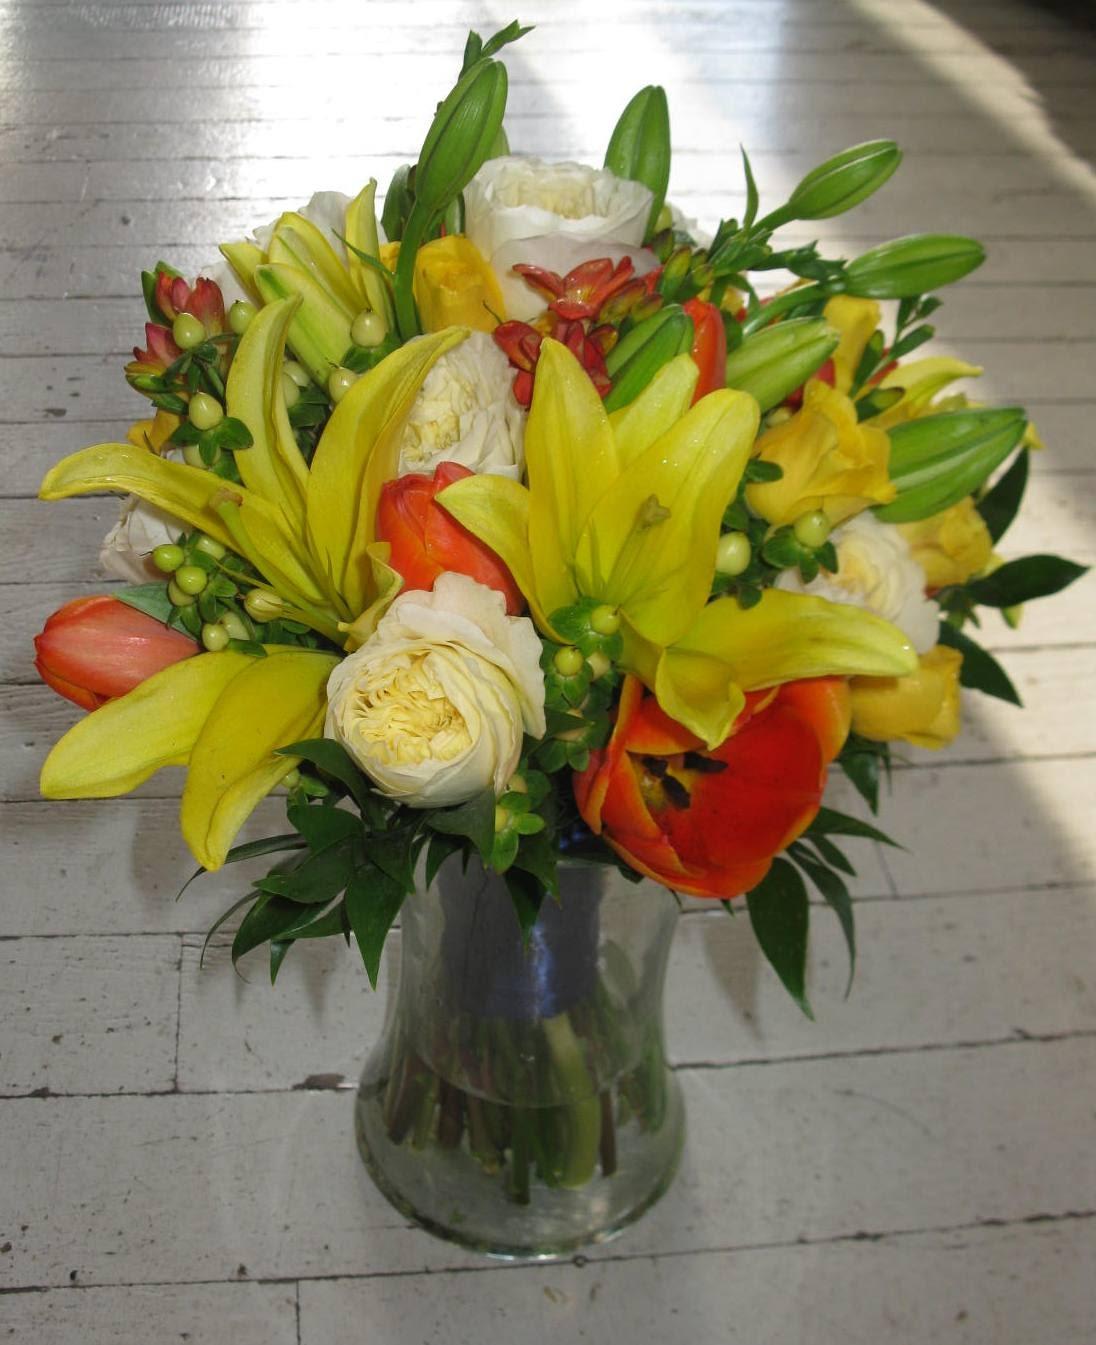 wedding flowers gladiolus wedding flowers. Black Bedroom Furniture Sets. Home Design Ideas